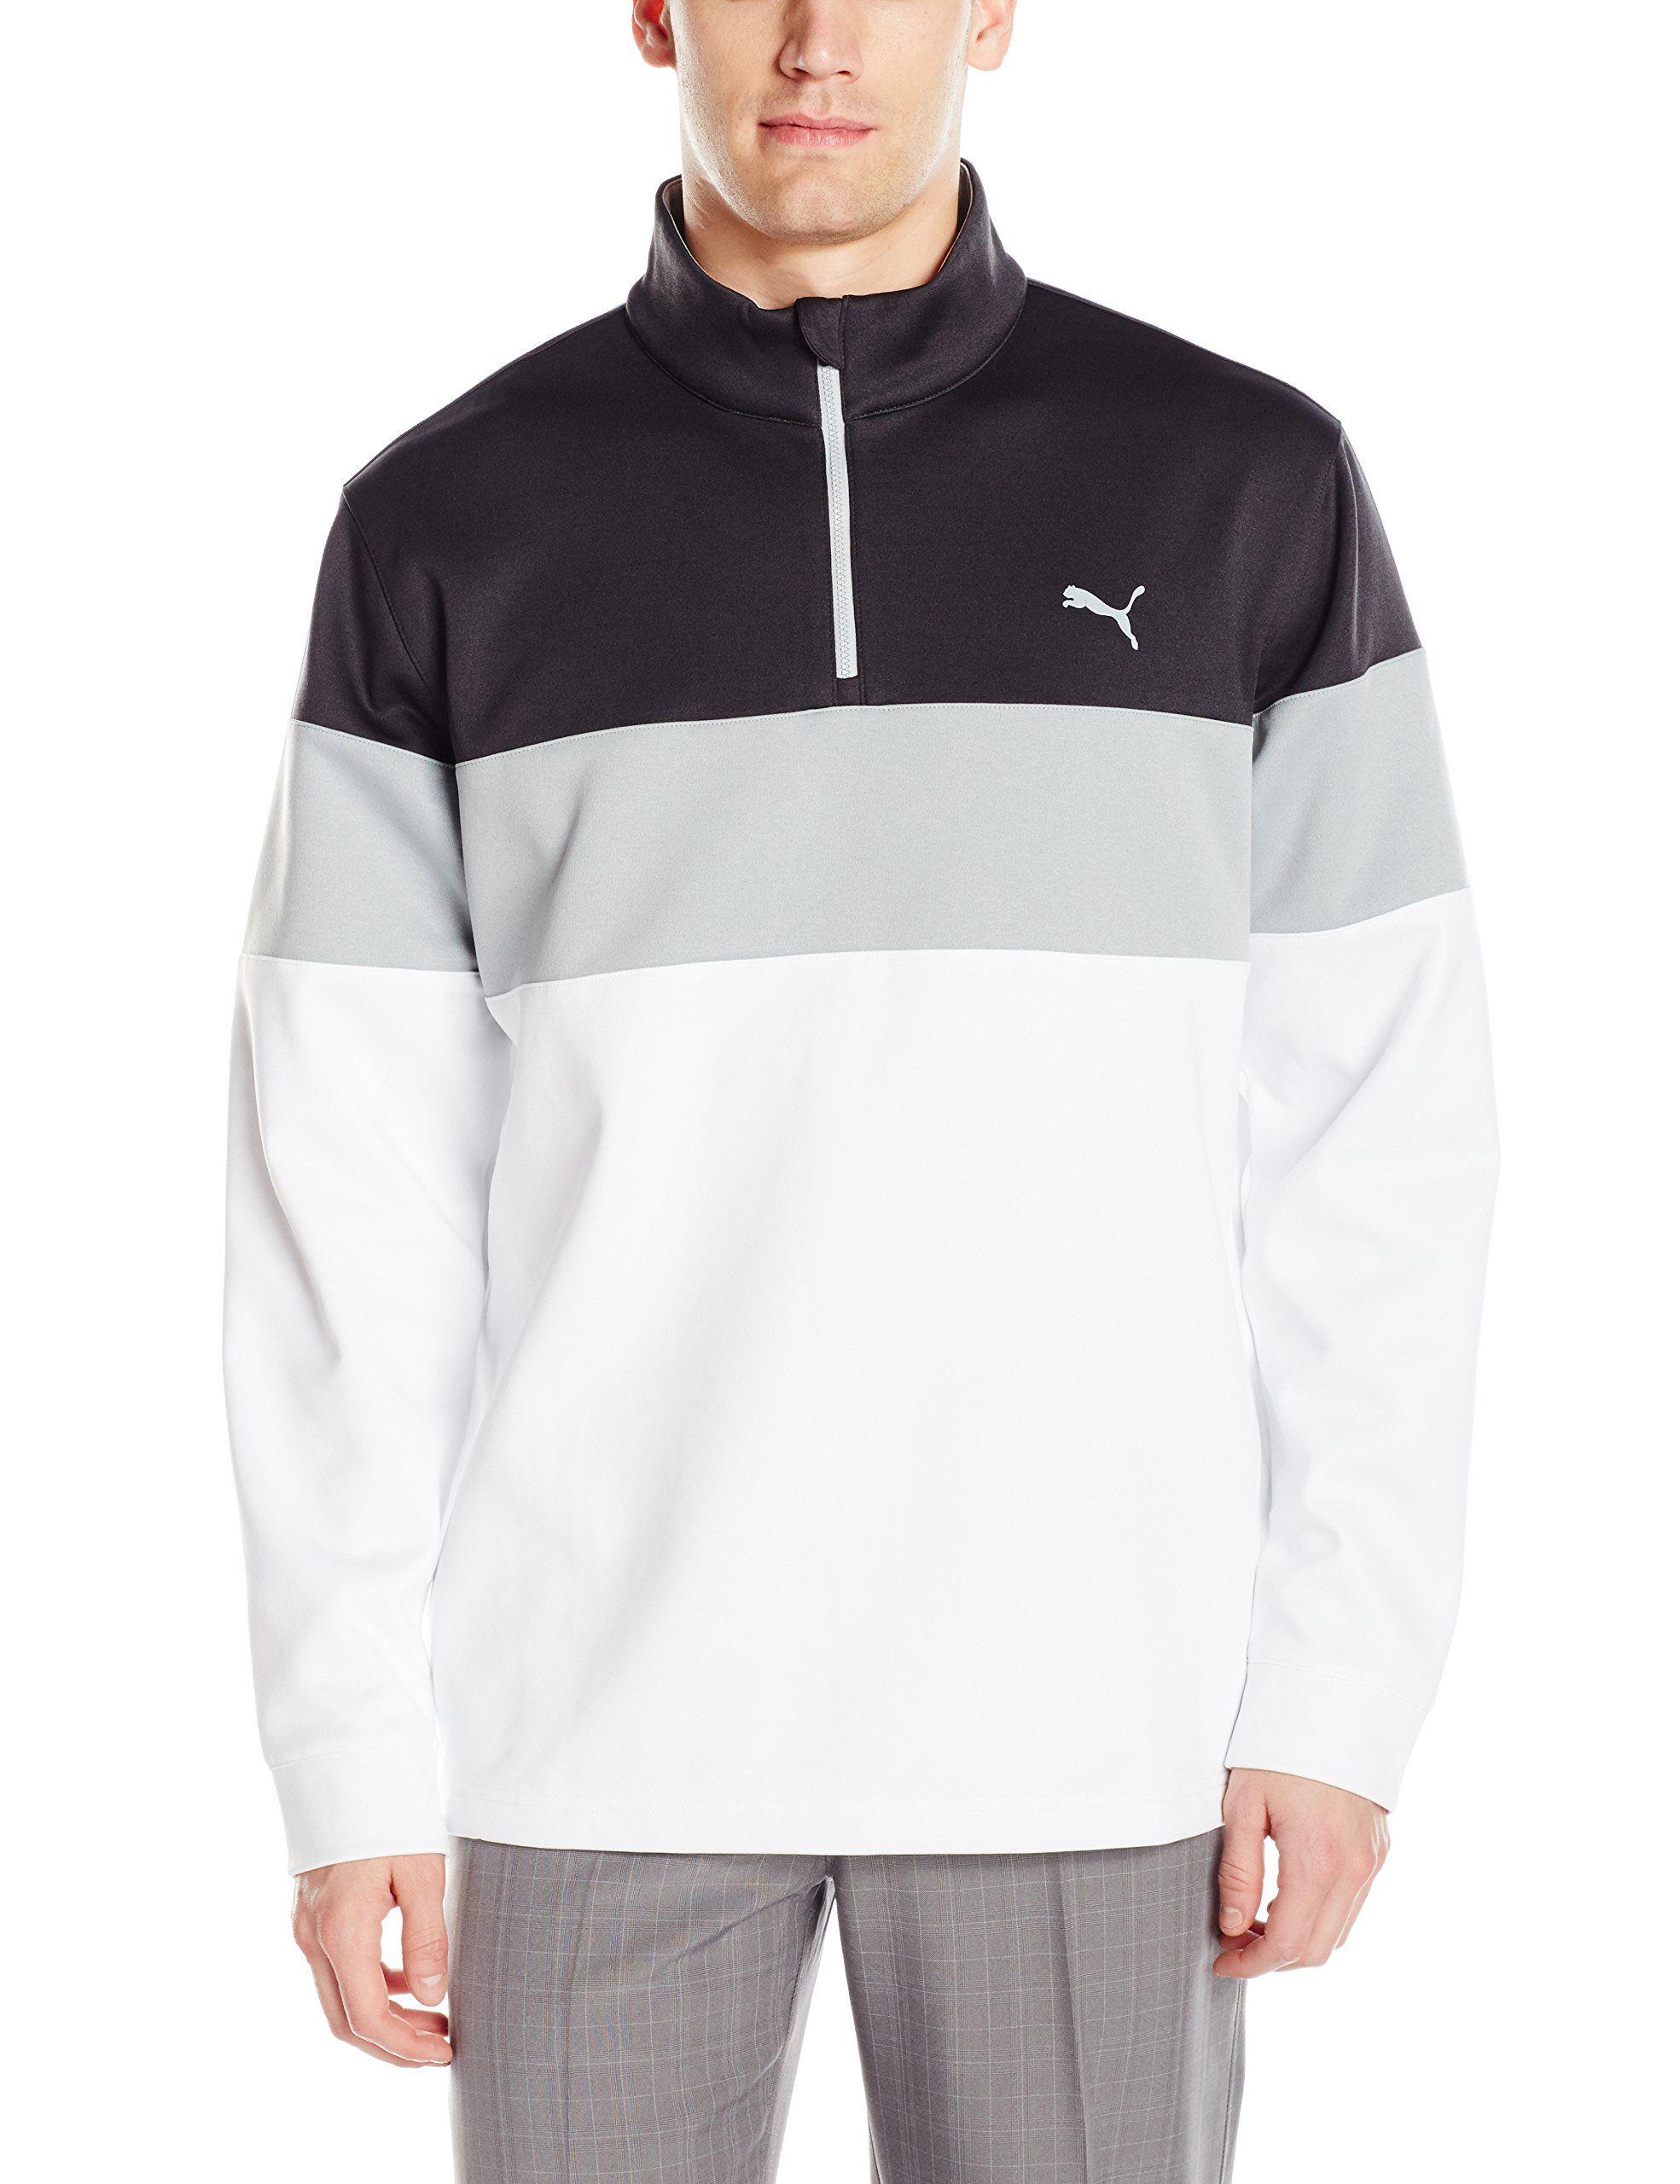 a7875a961aa4 Men Golf Clothing - PUMA Golf 2017 Mens Pwrwarm 1 4 Zip Popover Bright  White Dark Grey Heather XLarge